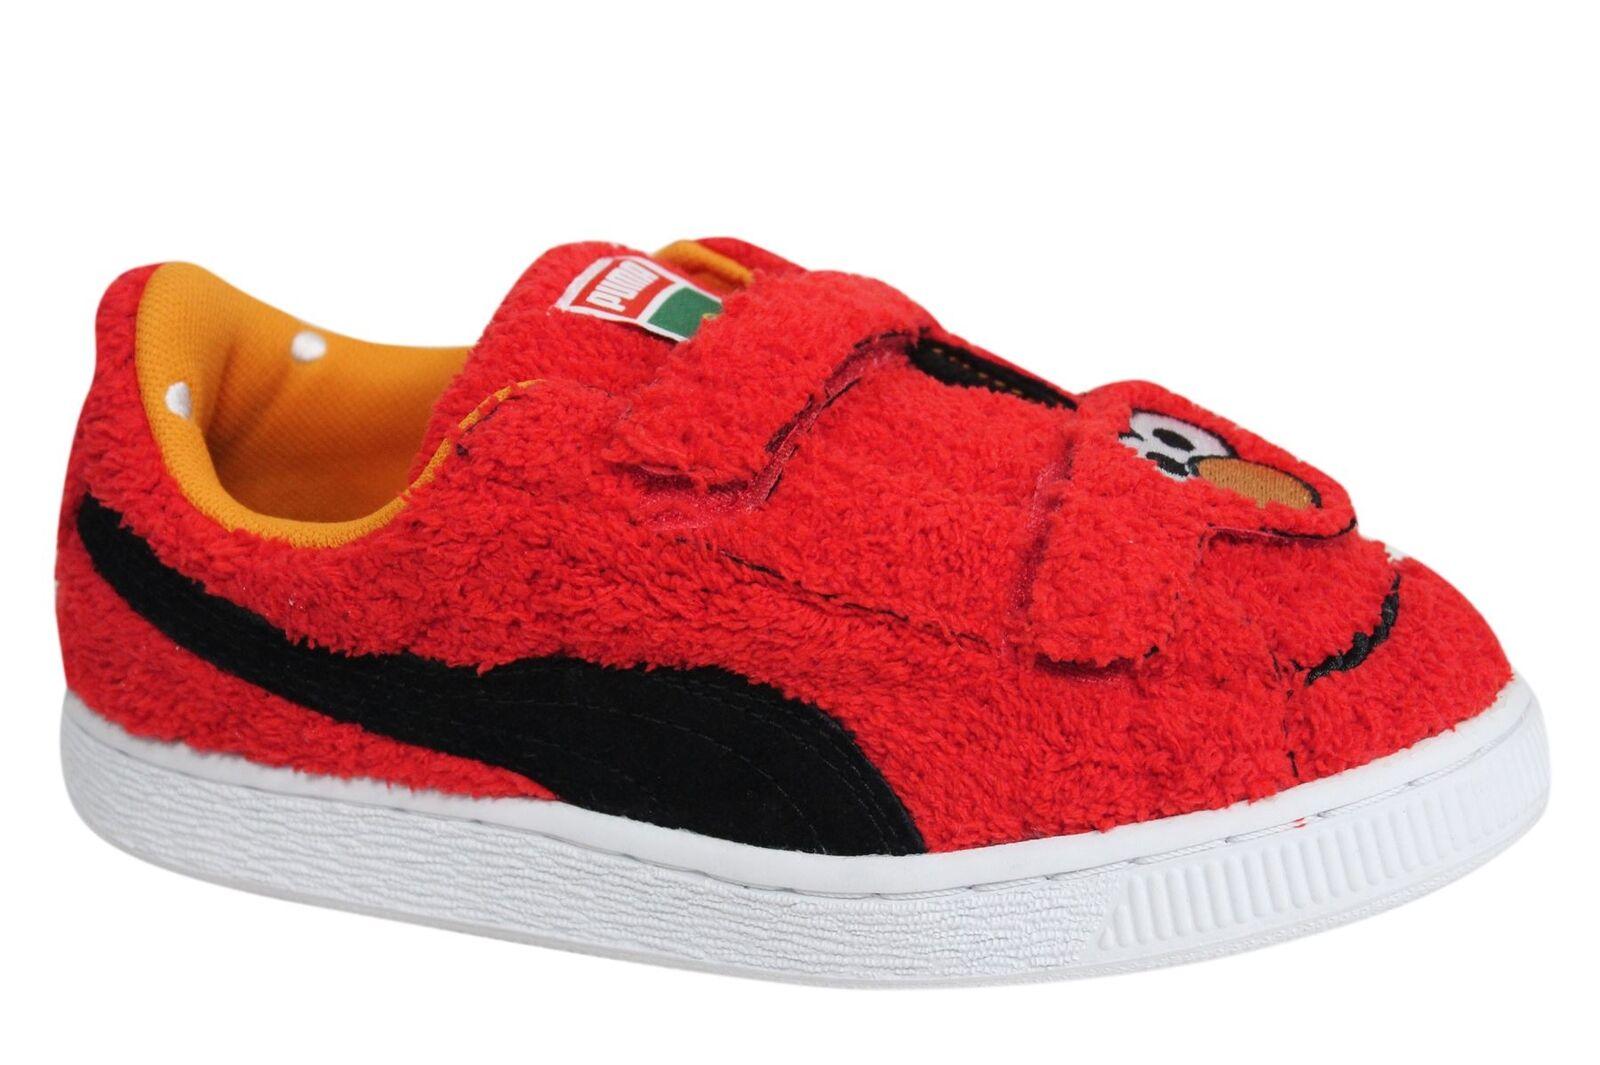 elmo puma shoes 5cm in inches